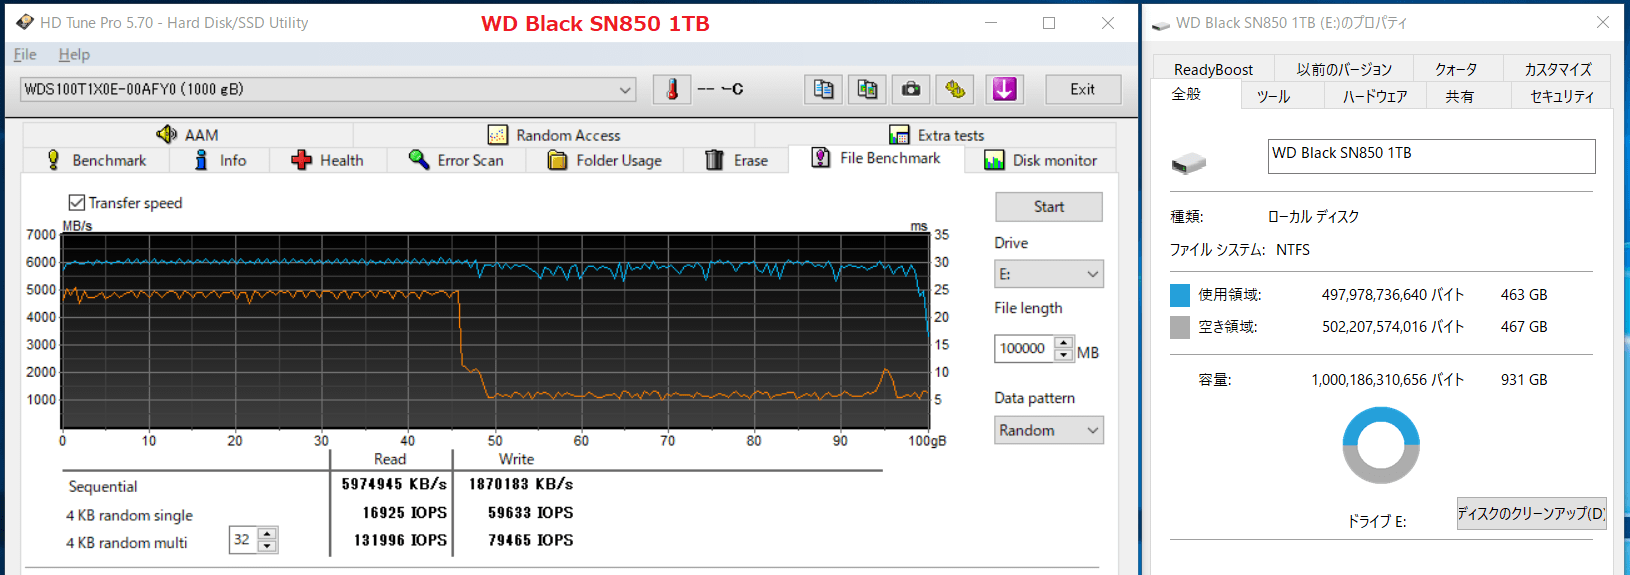 WD Black SN850 1TB_SLC-Cache_450GB-Free